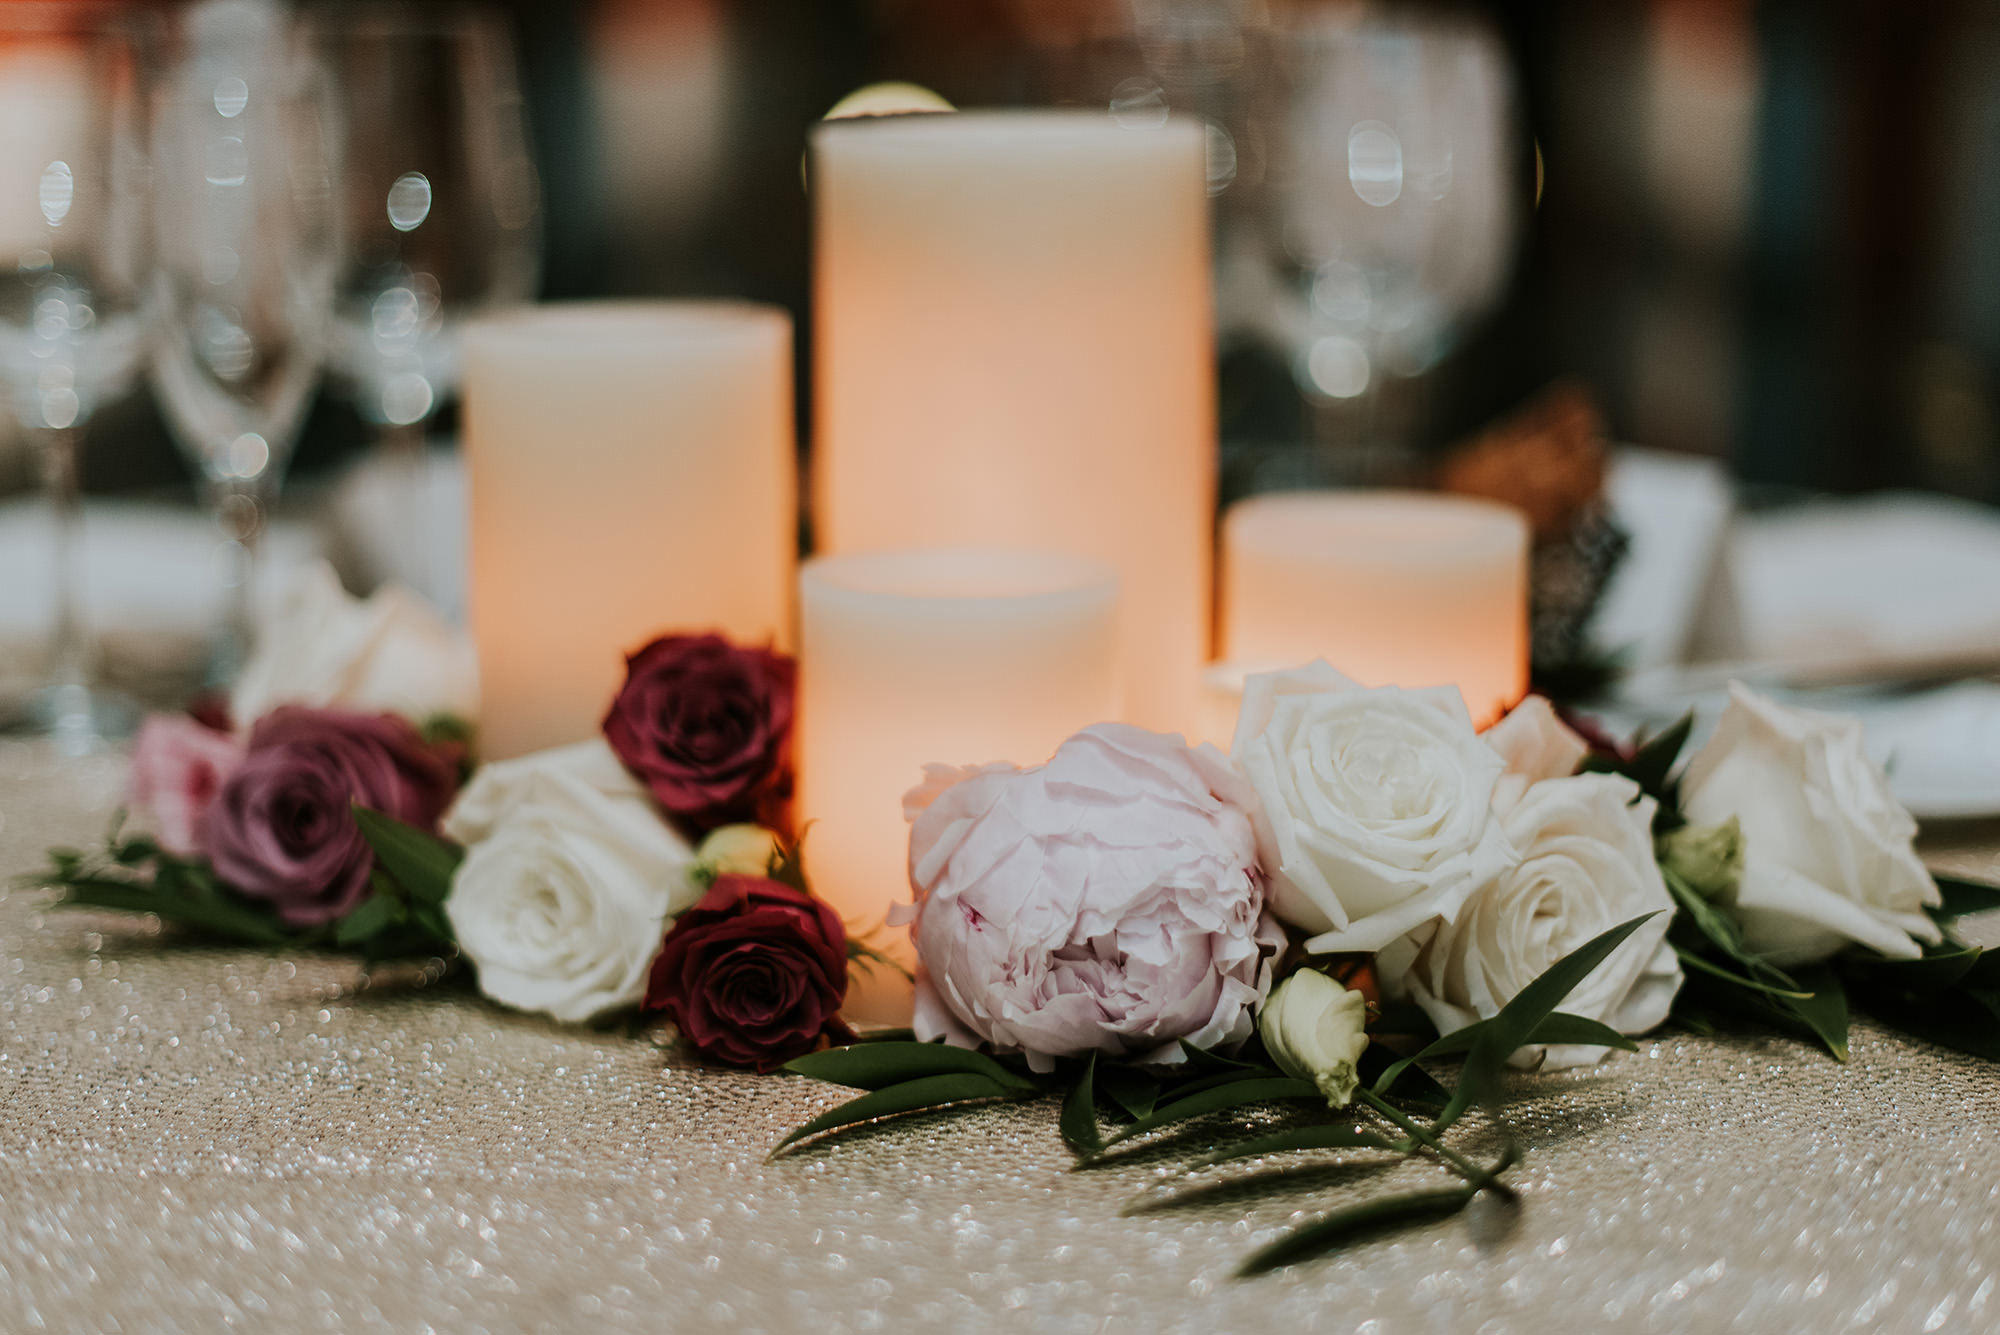 56 Sweetheart Table Candles Roses Peonies Blush Mauve Greenery PAFA Wedding.jpg